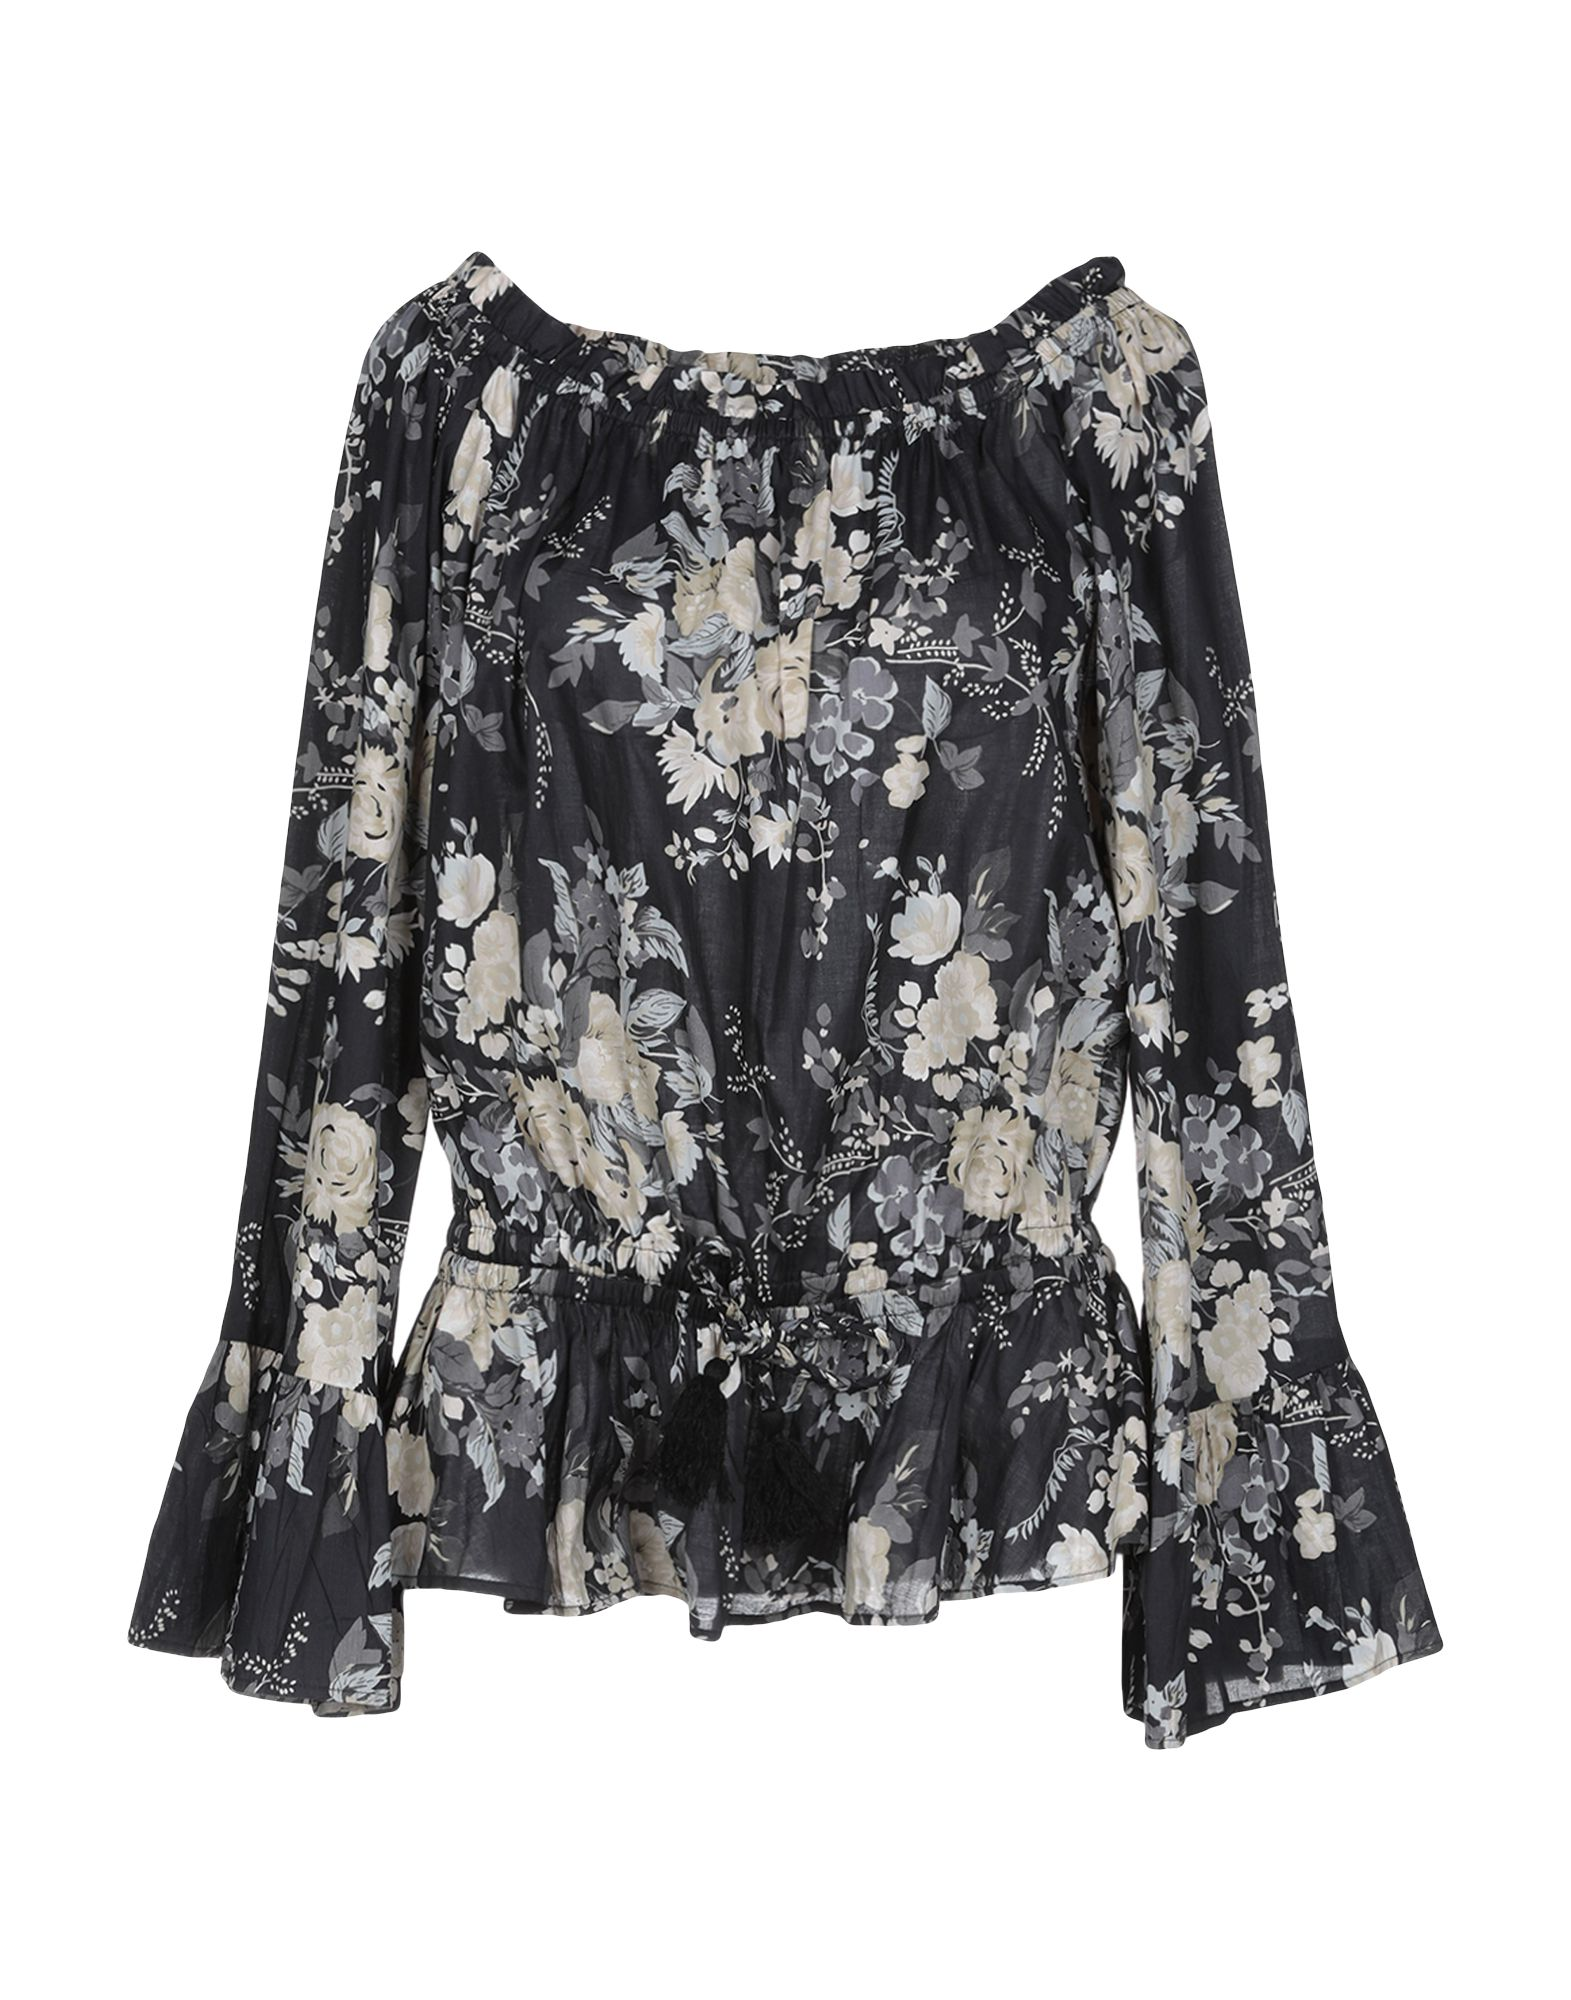 MY TWIN by TWIN SET Блузка twin set блузка комплект twin set p29270 2buy серый l